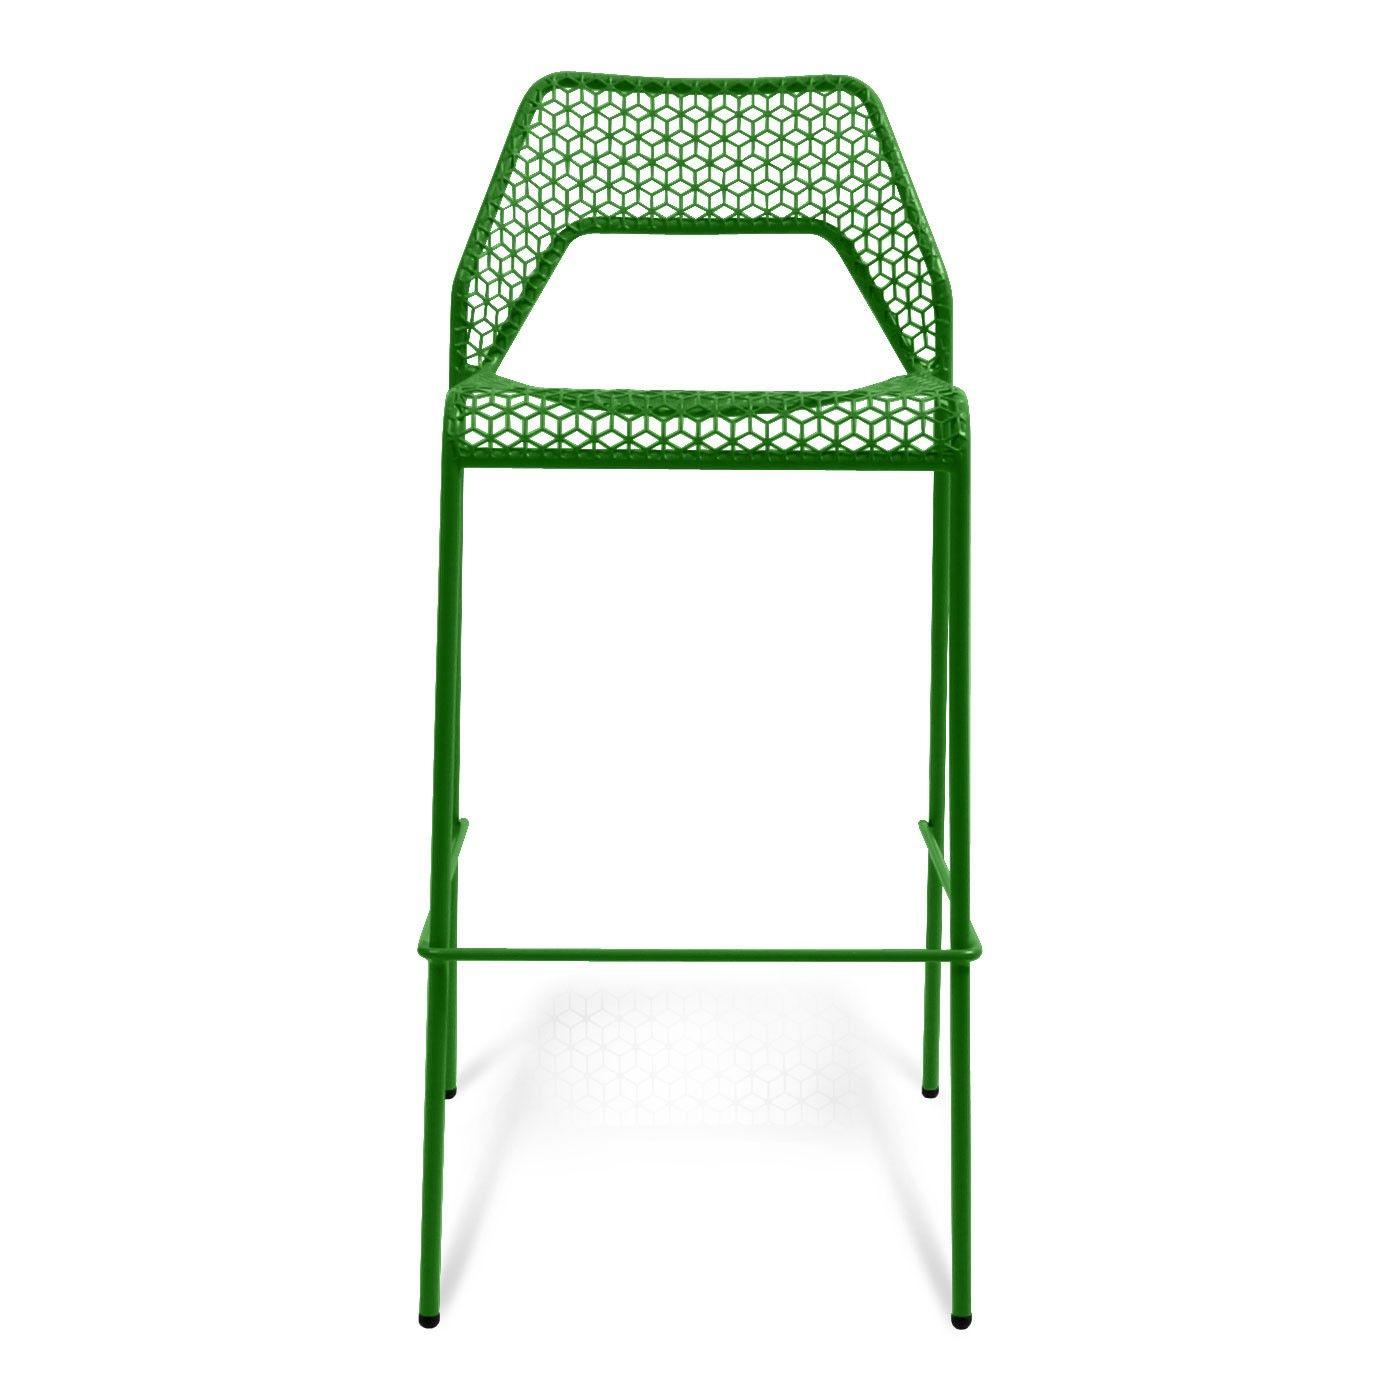 hot-mesh-modern-barstool-green 1  sc 1 st  Pinterest & hot-mesh-modern-barstool-green 1 | Kitchen | Pinterest | Stools ... islam-shia.org